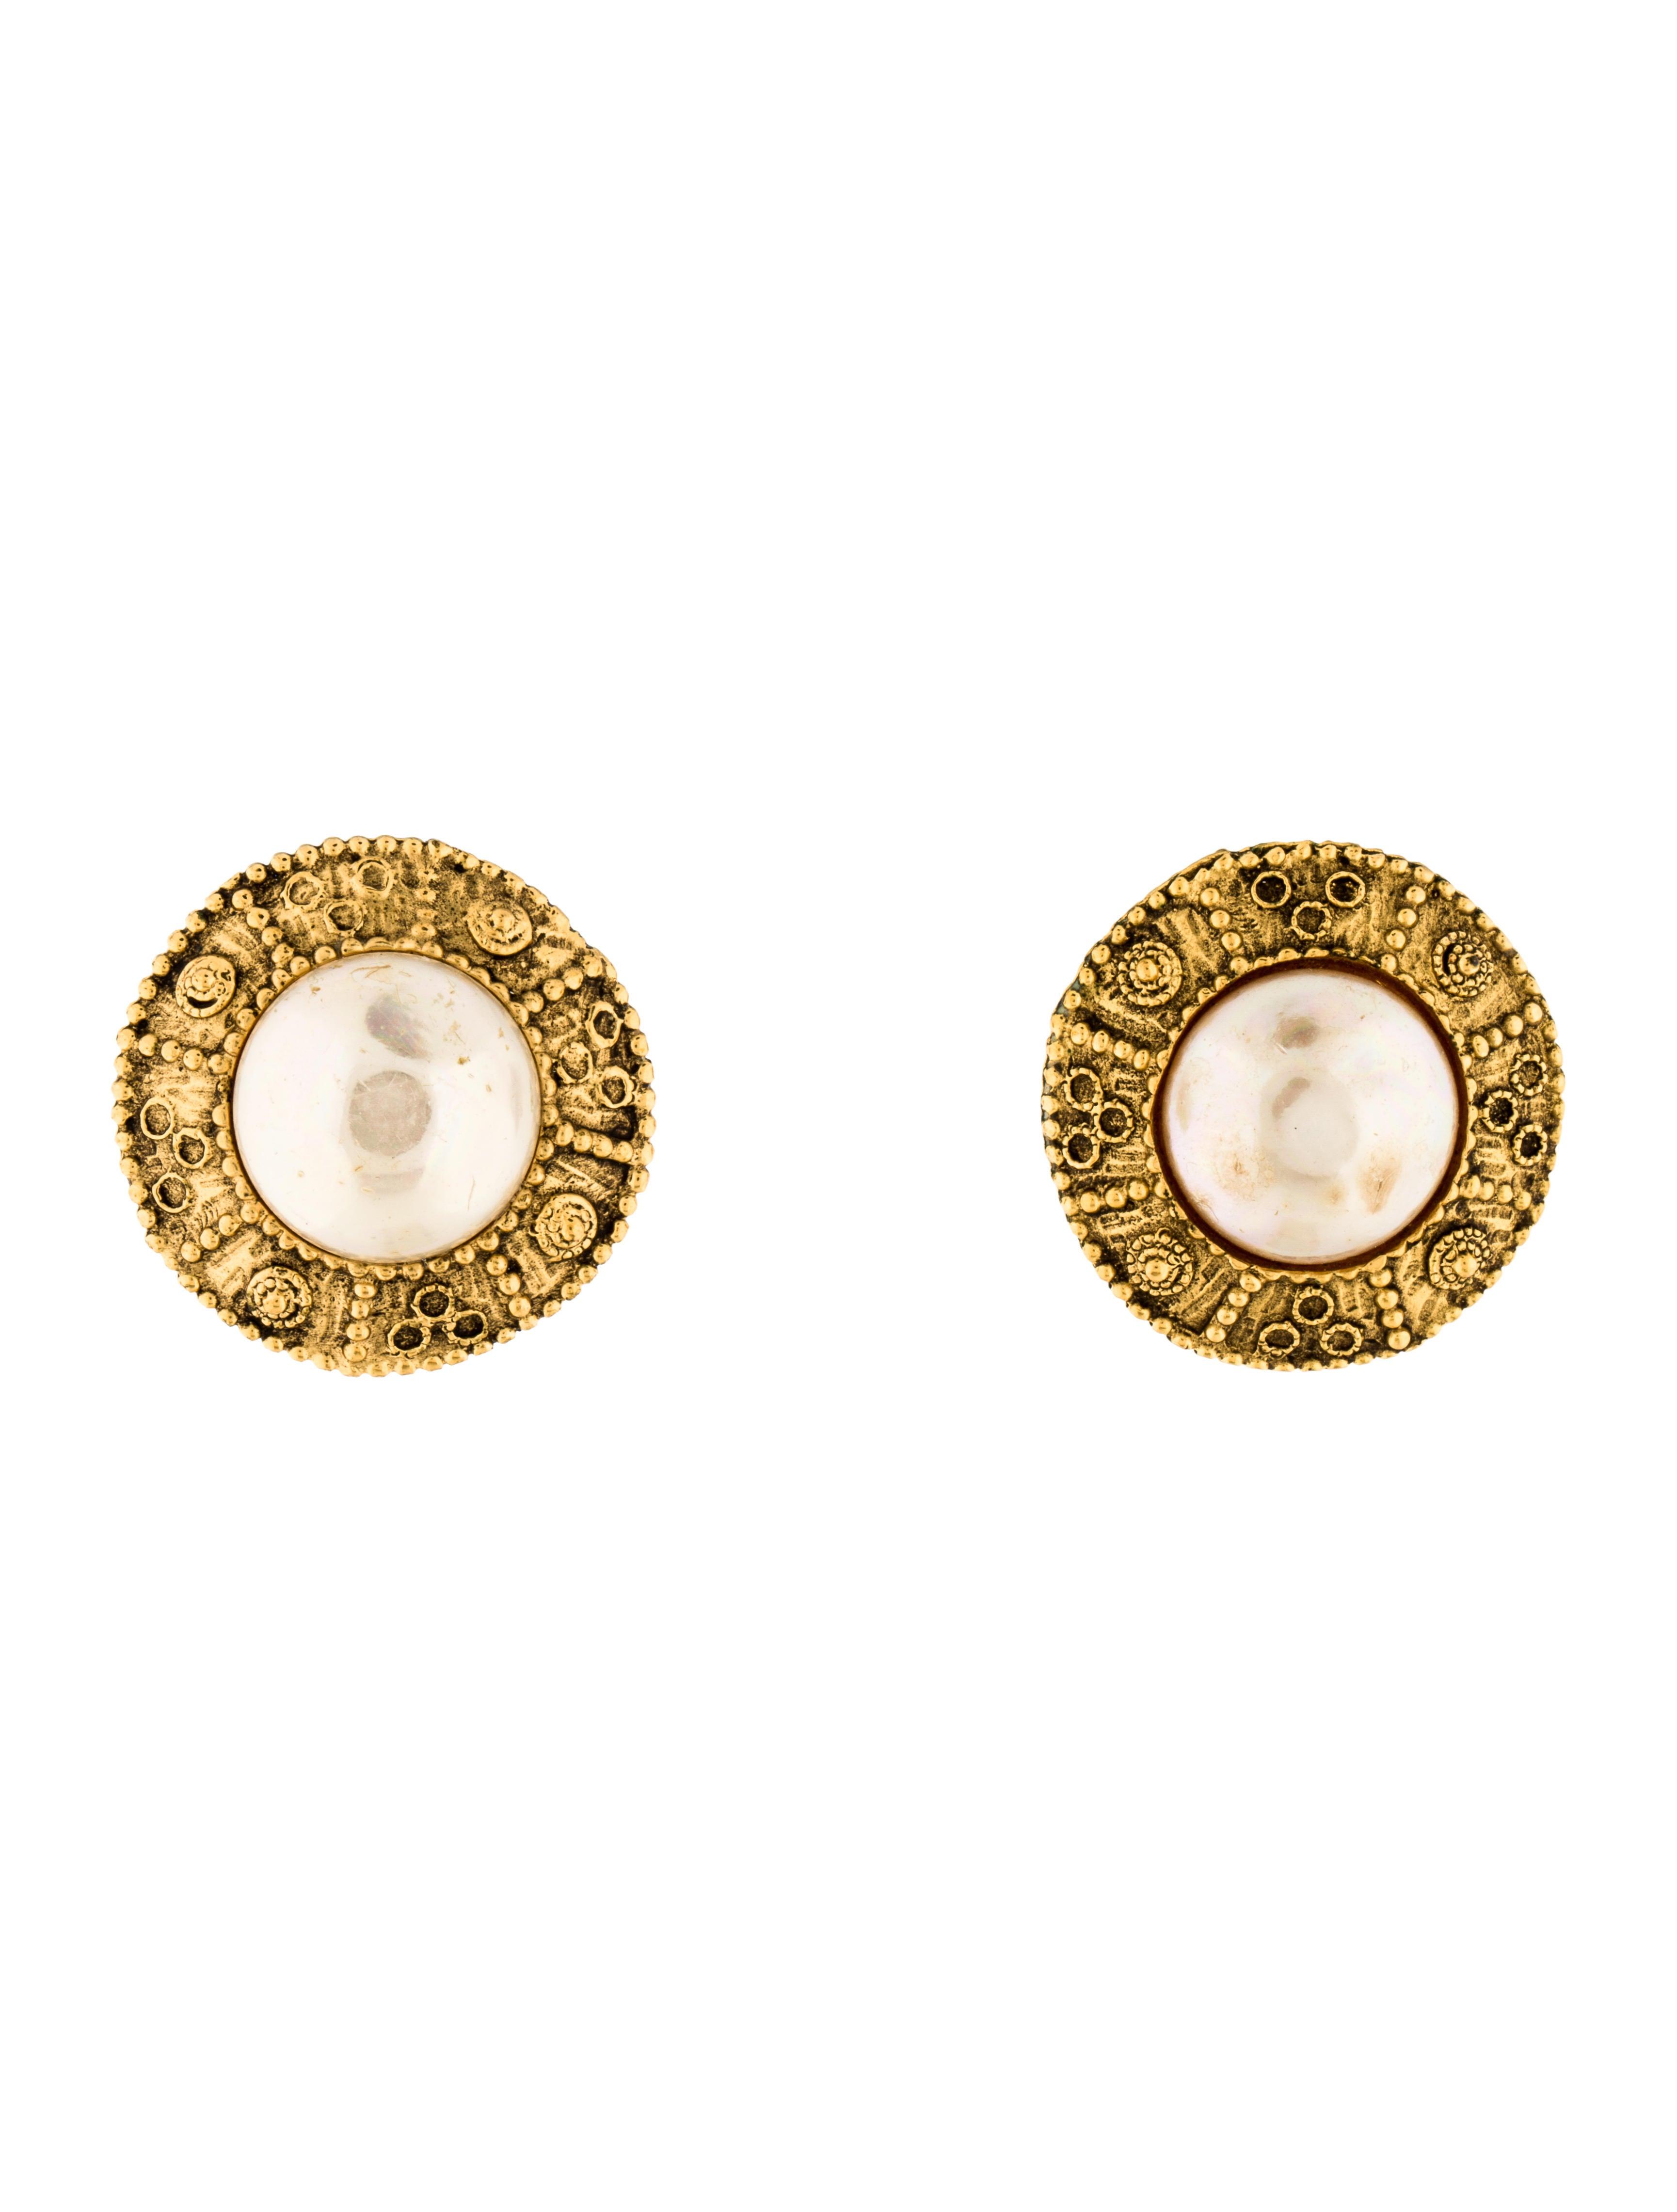 chanel faux pearl clip on earrings earrings cha169997. Black Bedroom Furniture Sets. Home Design Ideas